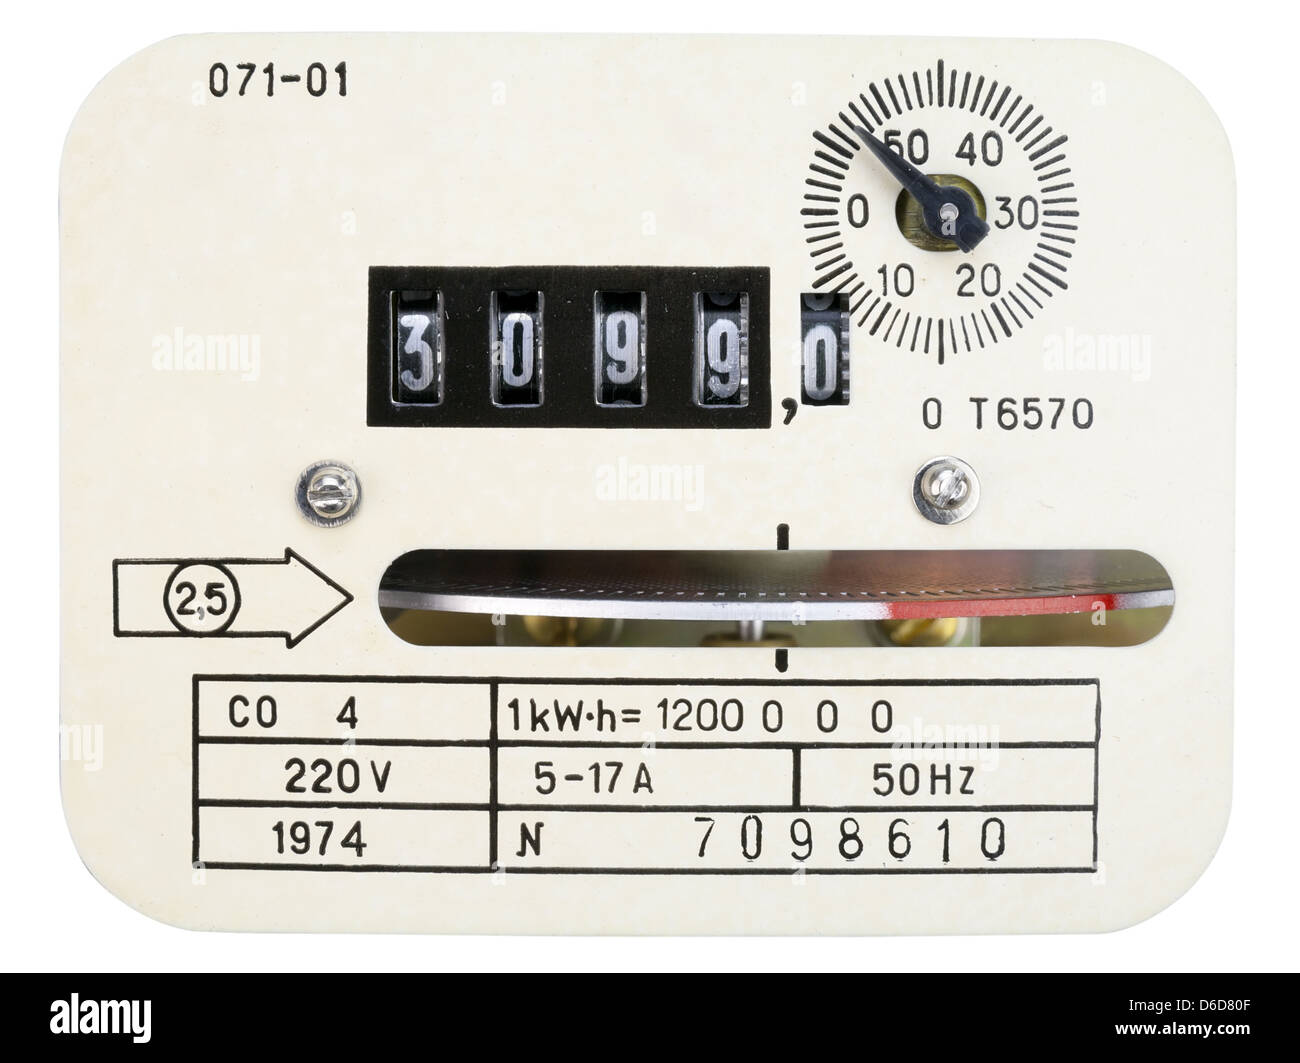 Retro measuring instrument of electric energy - Stock Image